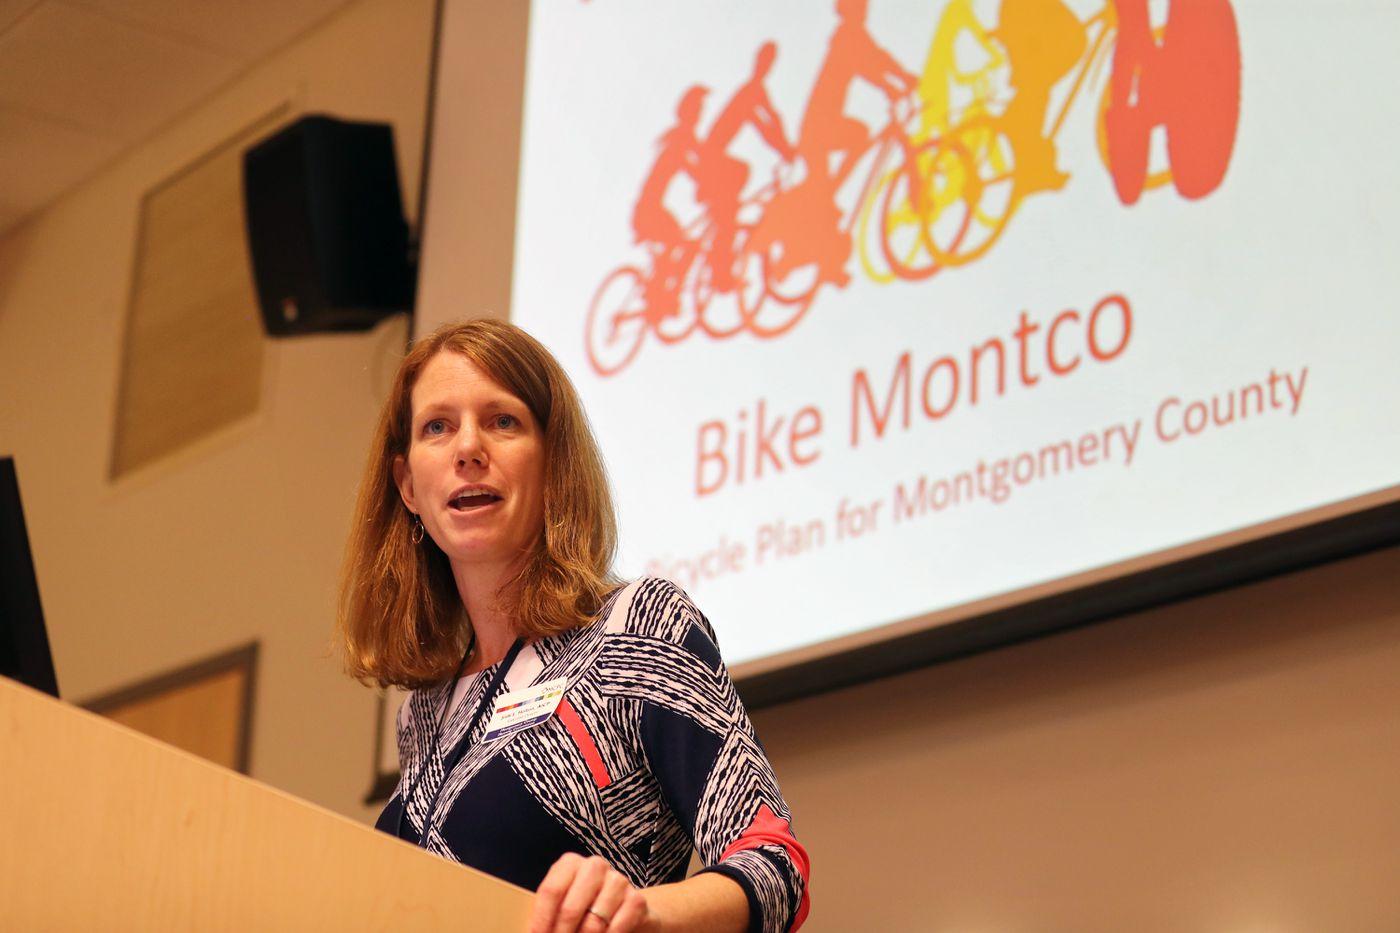 'Bike Montco' initiative envisions 800 miles of new bike paths in suburbia